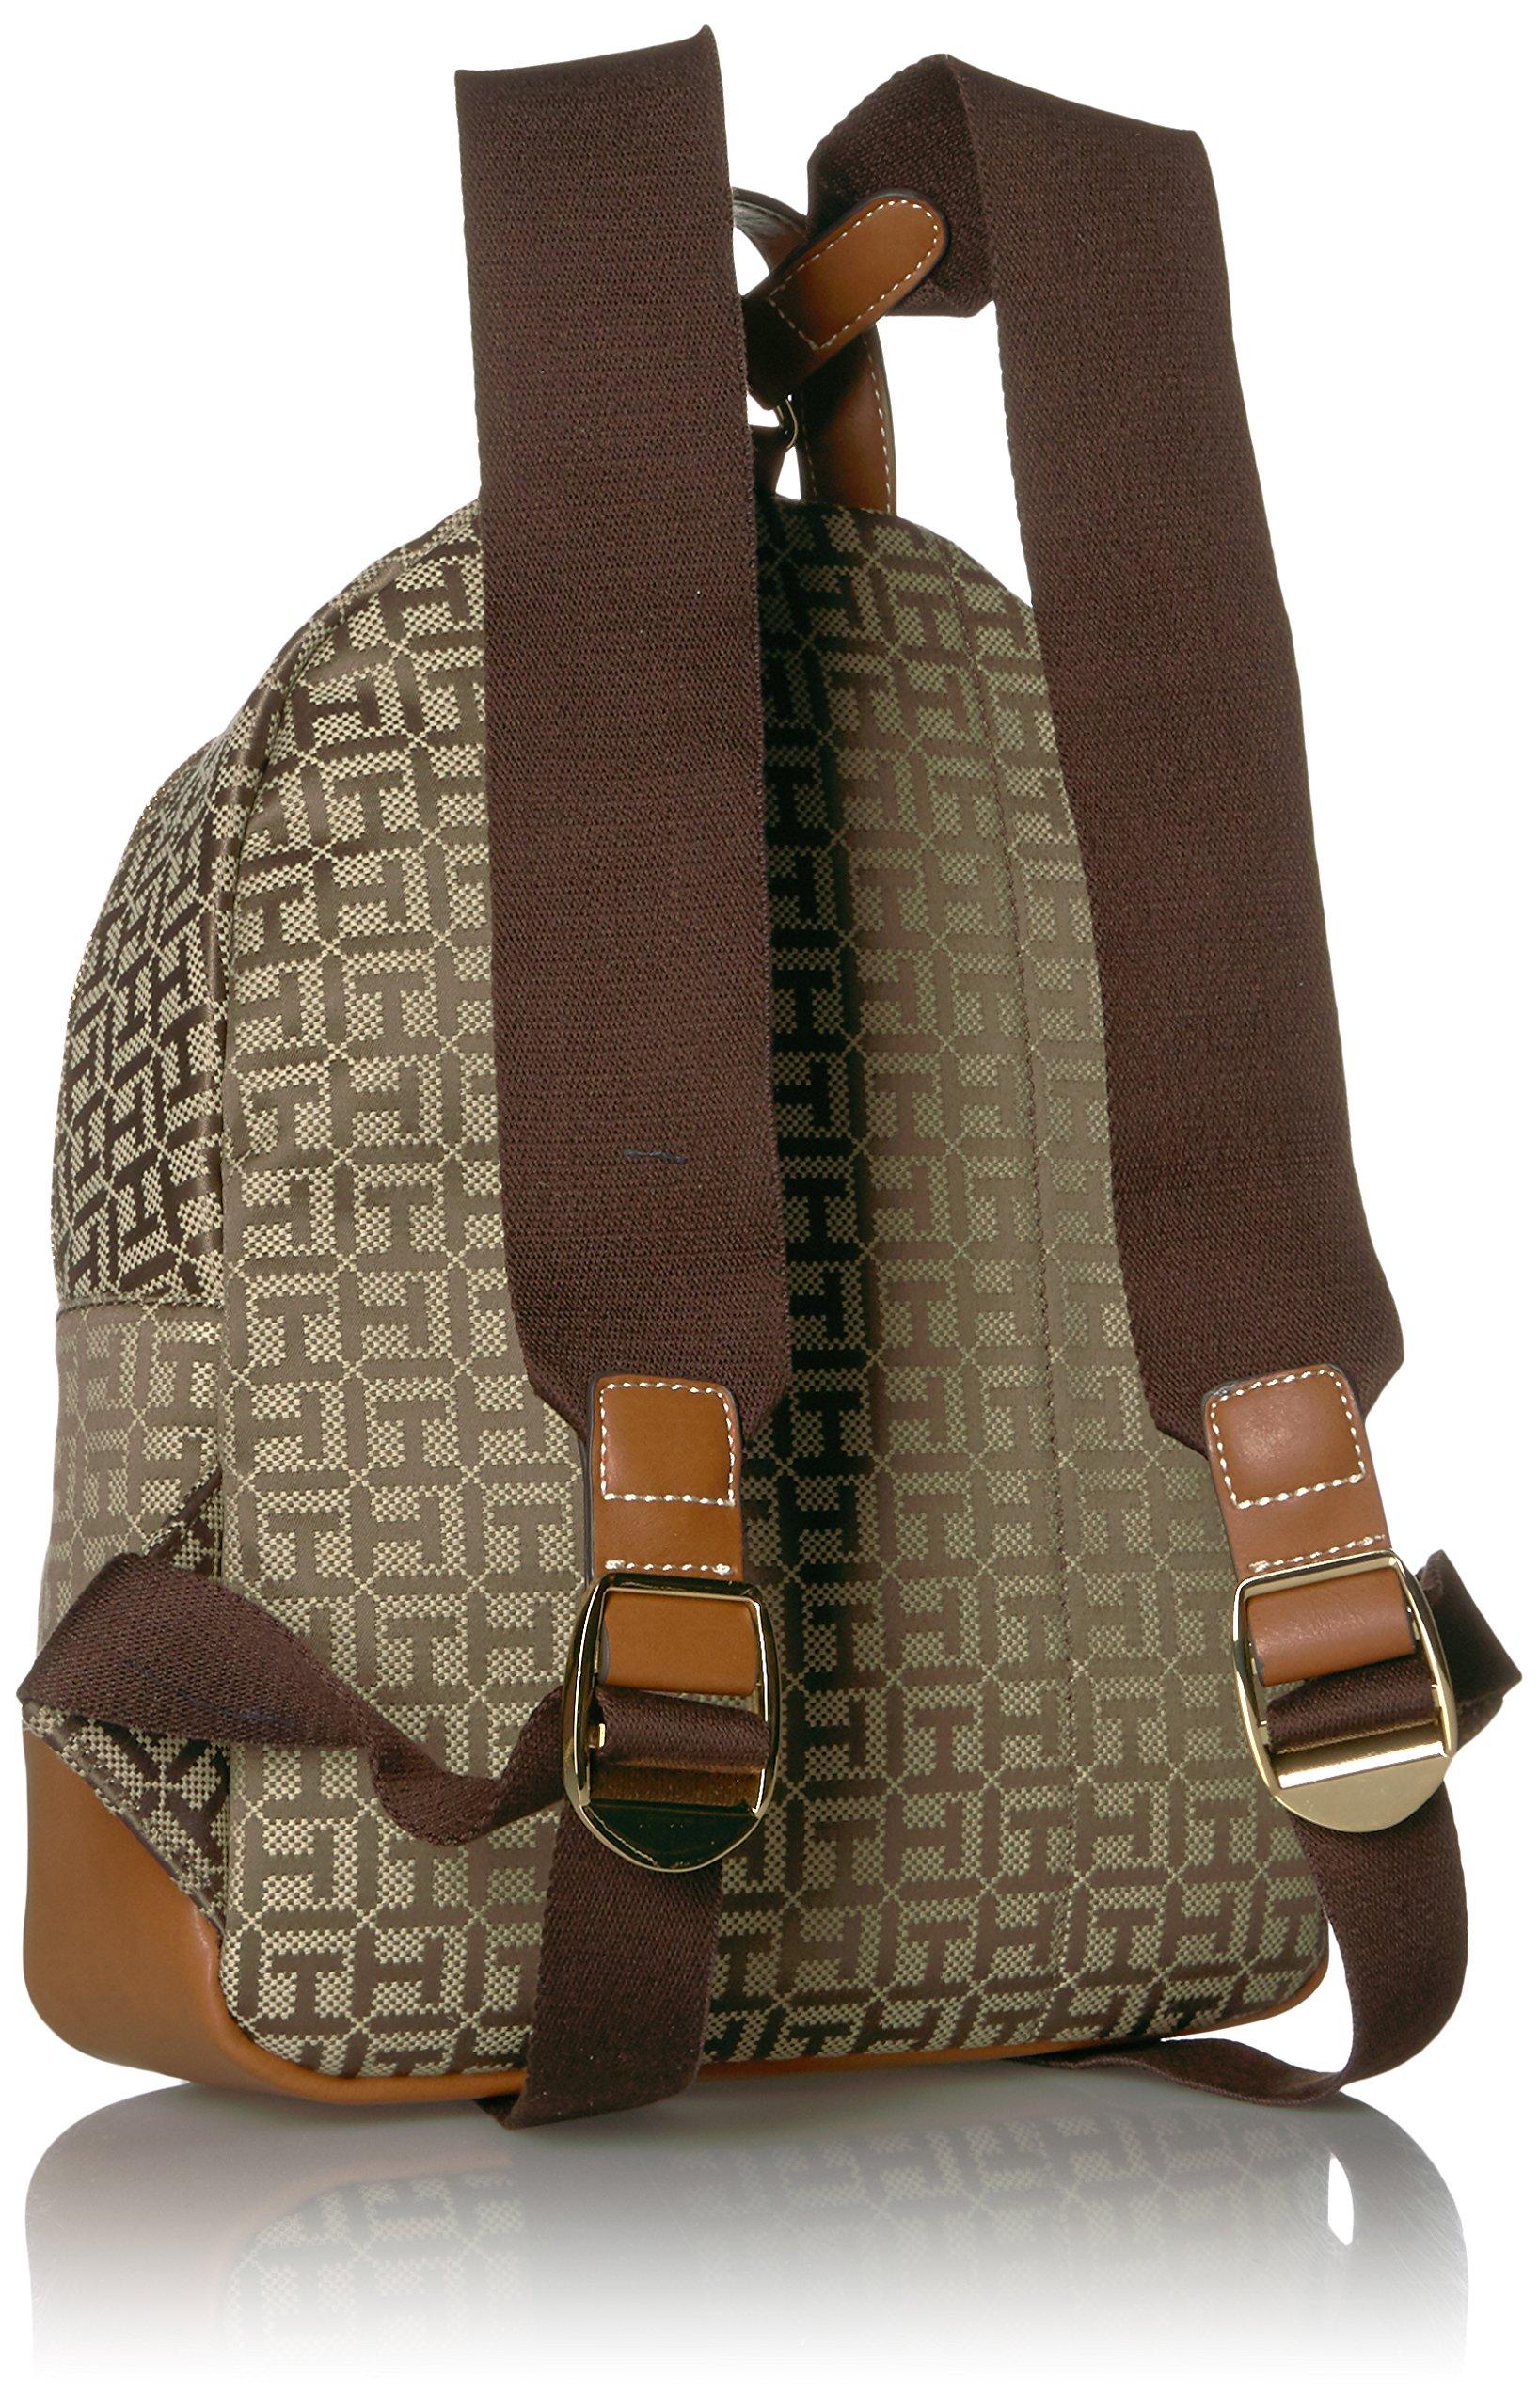 Tommy Hilfiger Women's Backpack Jaden, Tan Dark Chocolate by Tommy Hilfiger (Image #2)